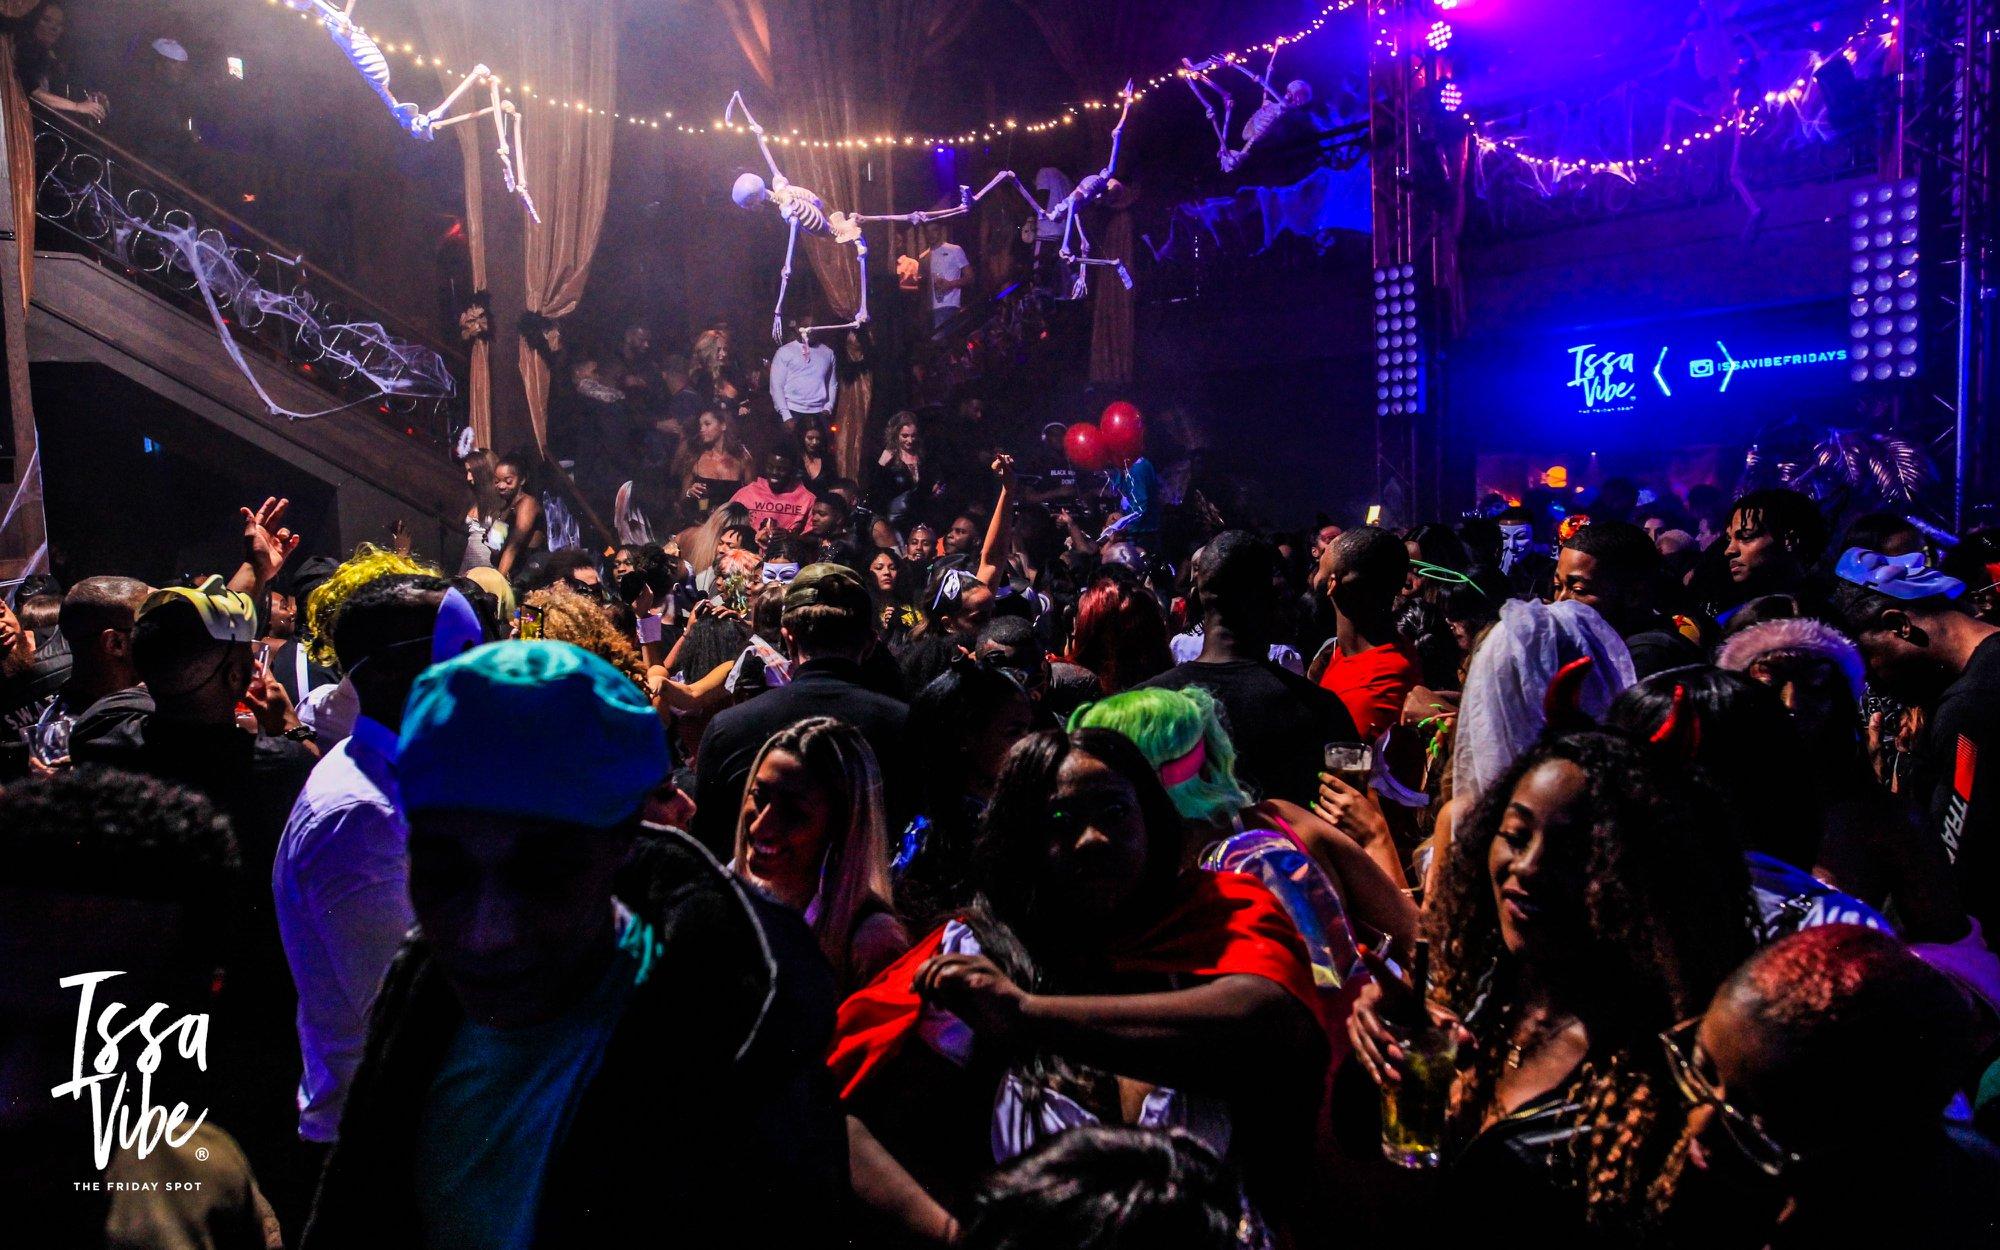 Issa Vibe – London's Biggest Halloween Party: HipHop, RnB, Bashment & Afrobeats!